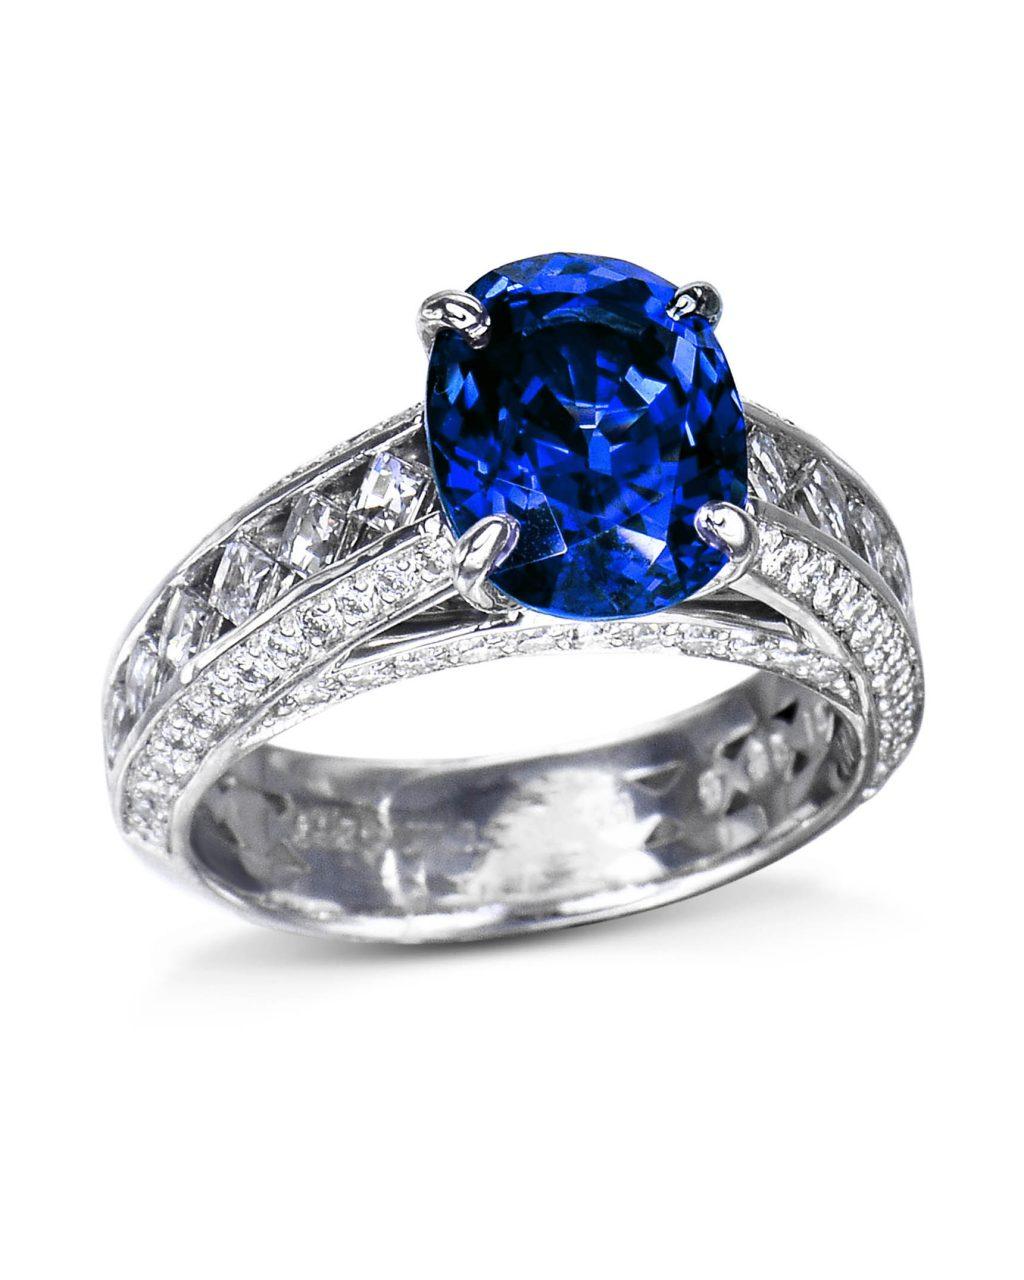 Oval Sapphire and Blaze-Cut Diamond Ring